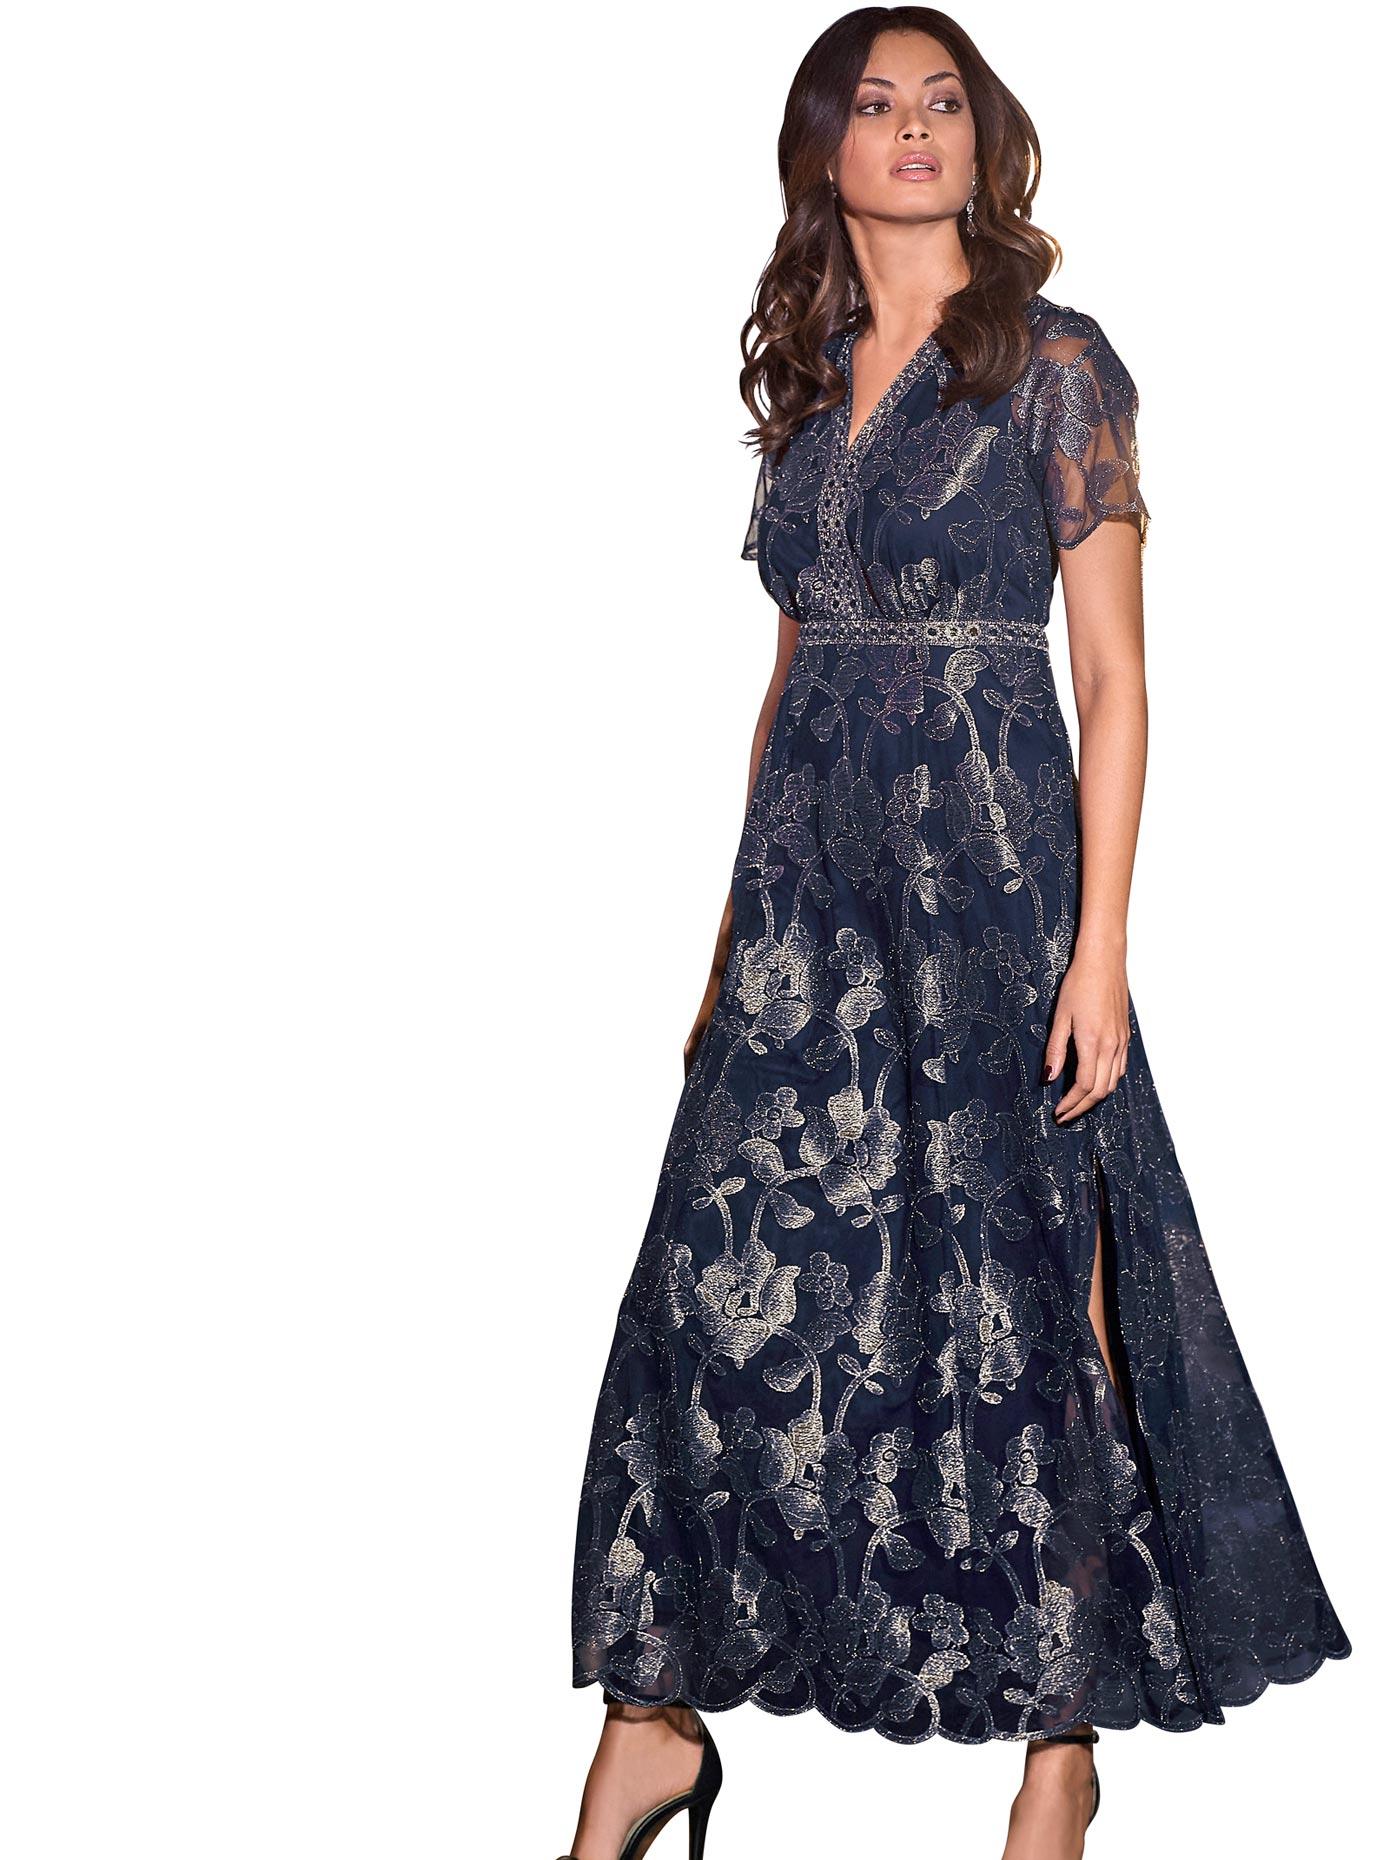 patrizia dini by heine -  Abendkleid Abendkleid